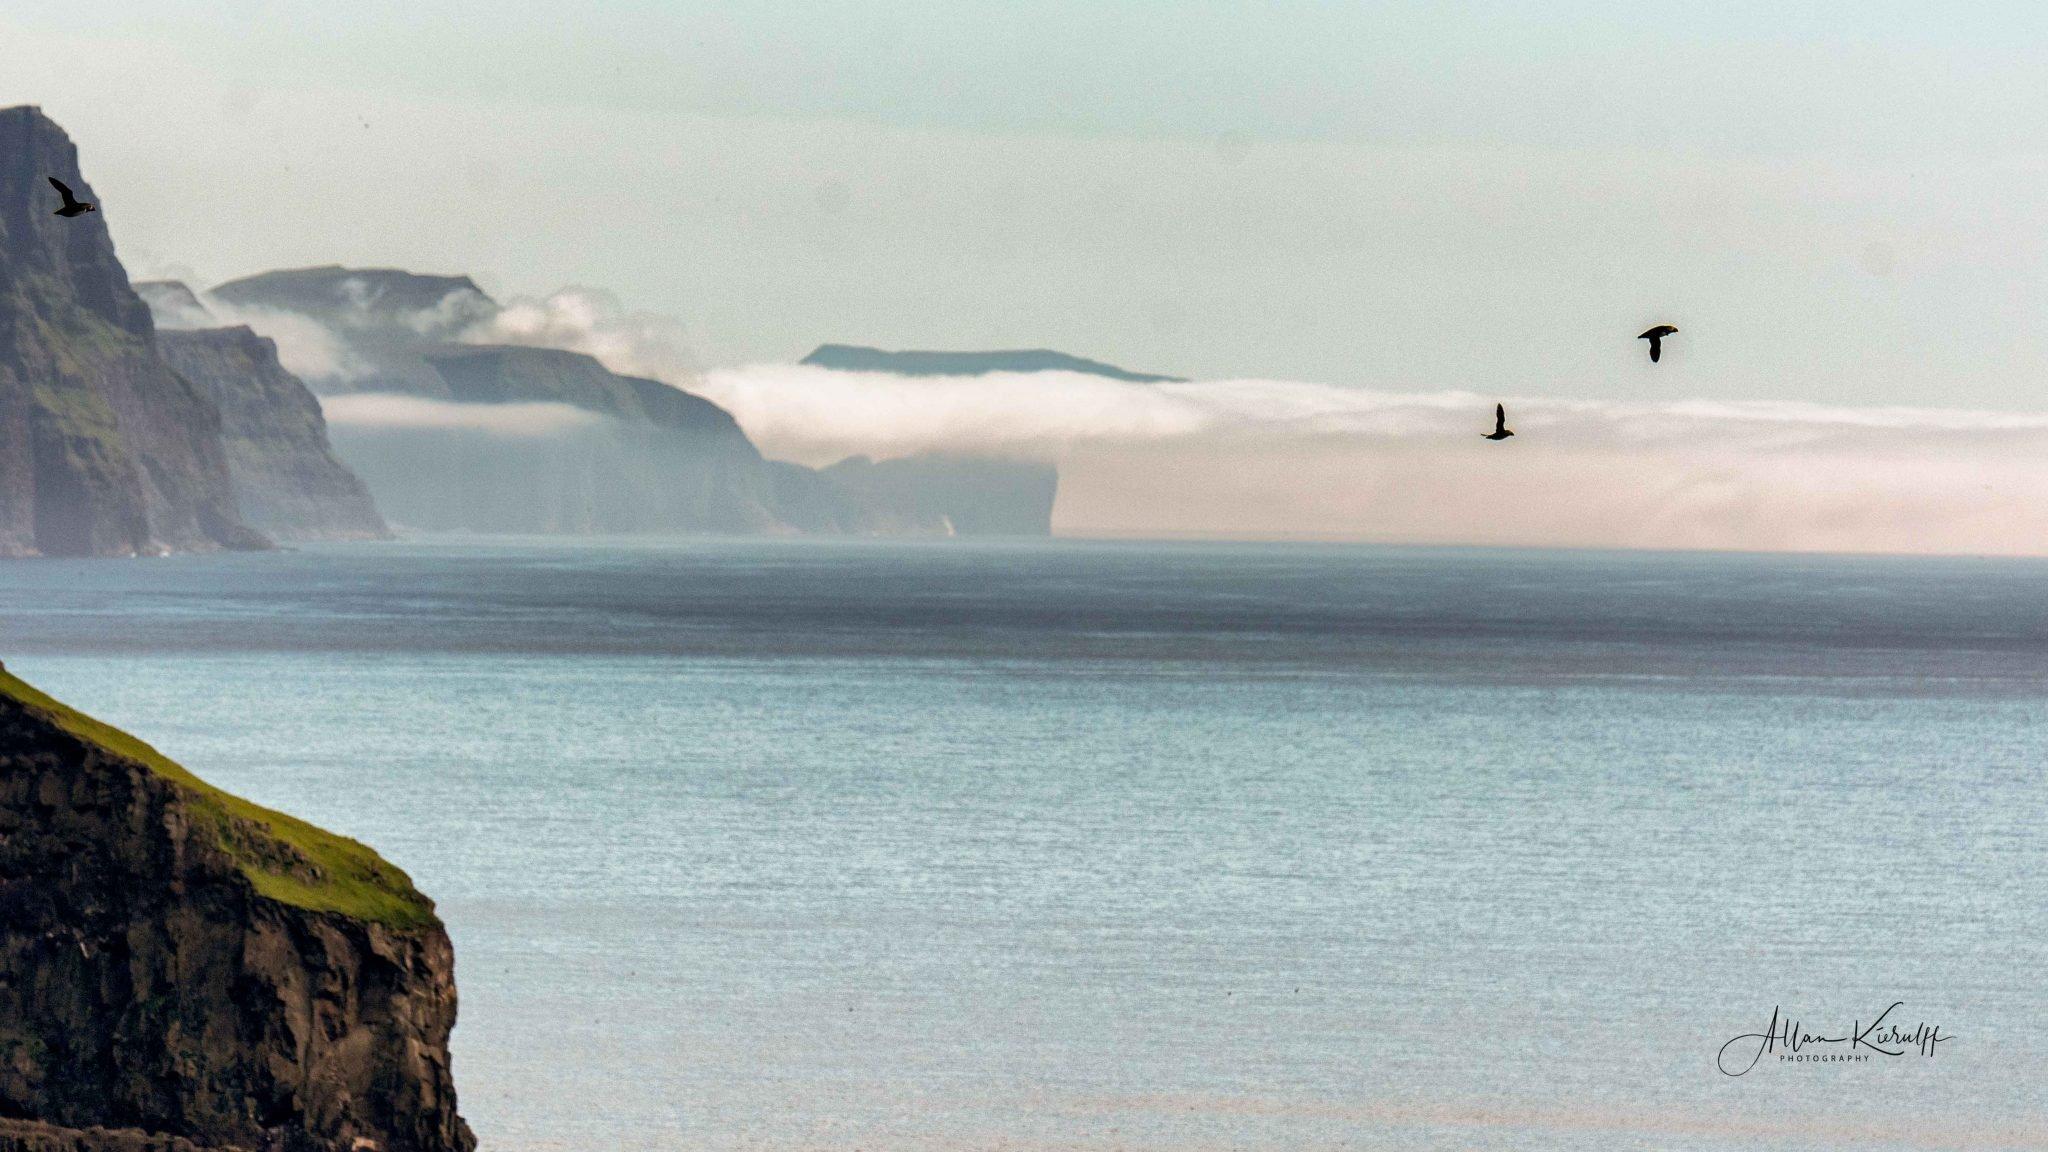 Mykines 12 10 - Tur til Mykineshólmur Lighthouse